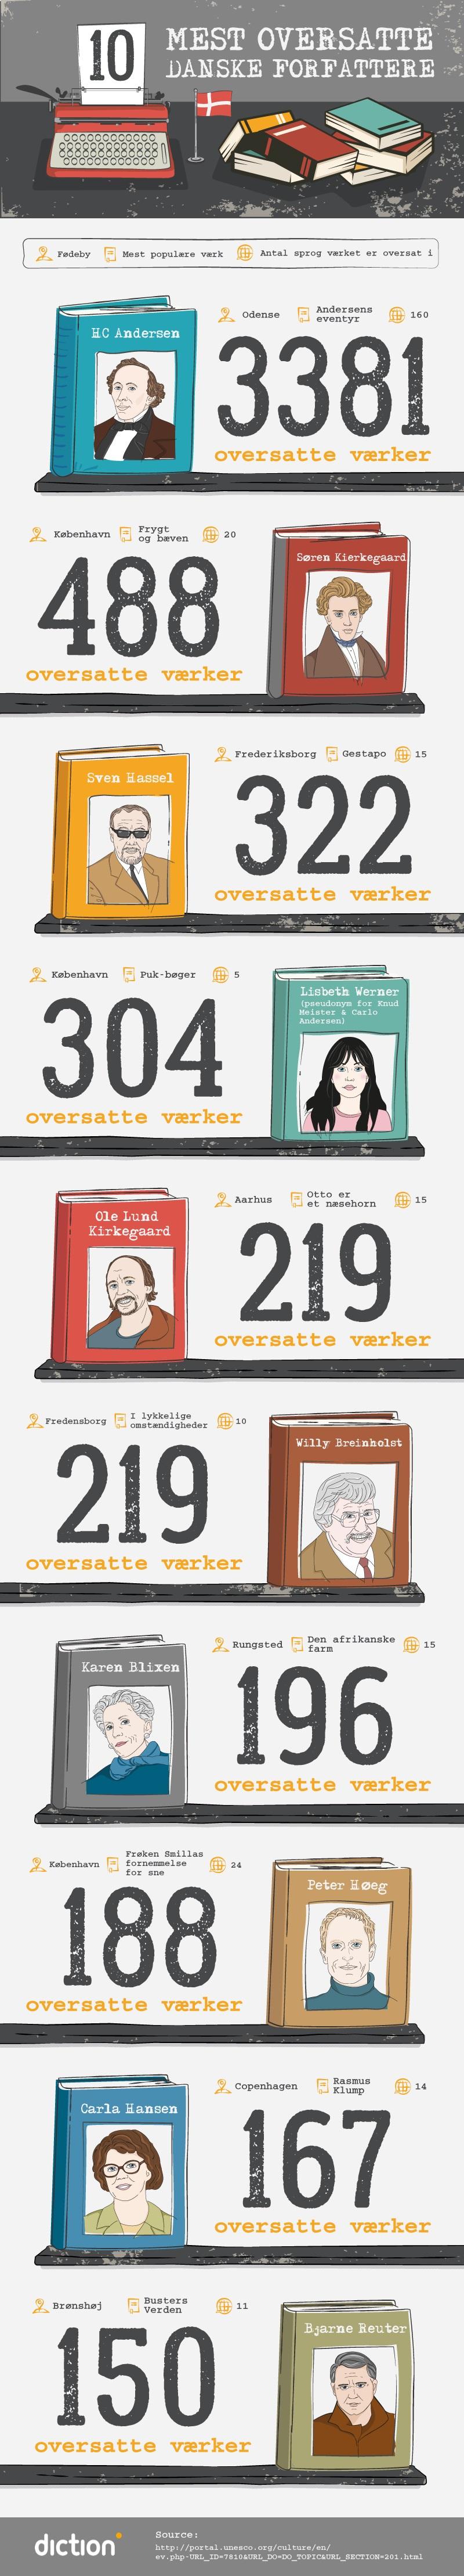 10 mest oversatte danske forfattere